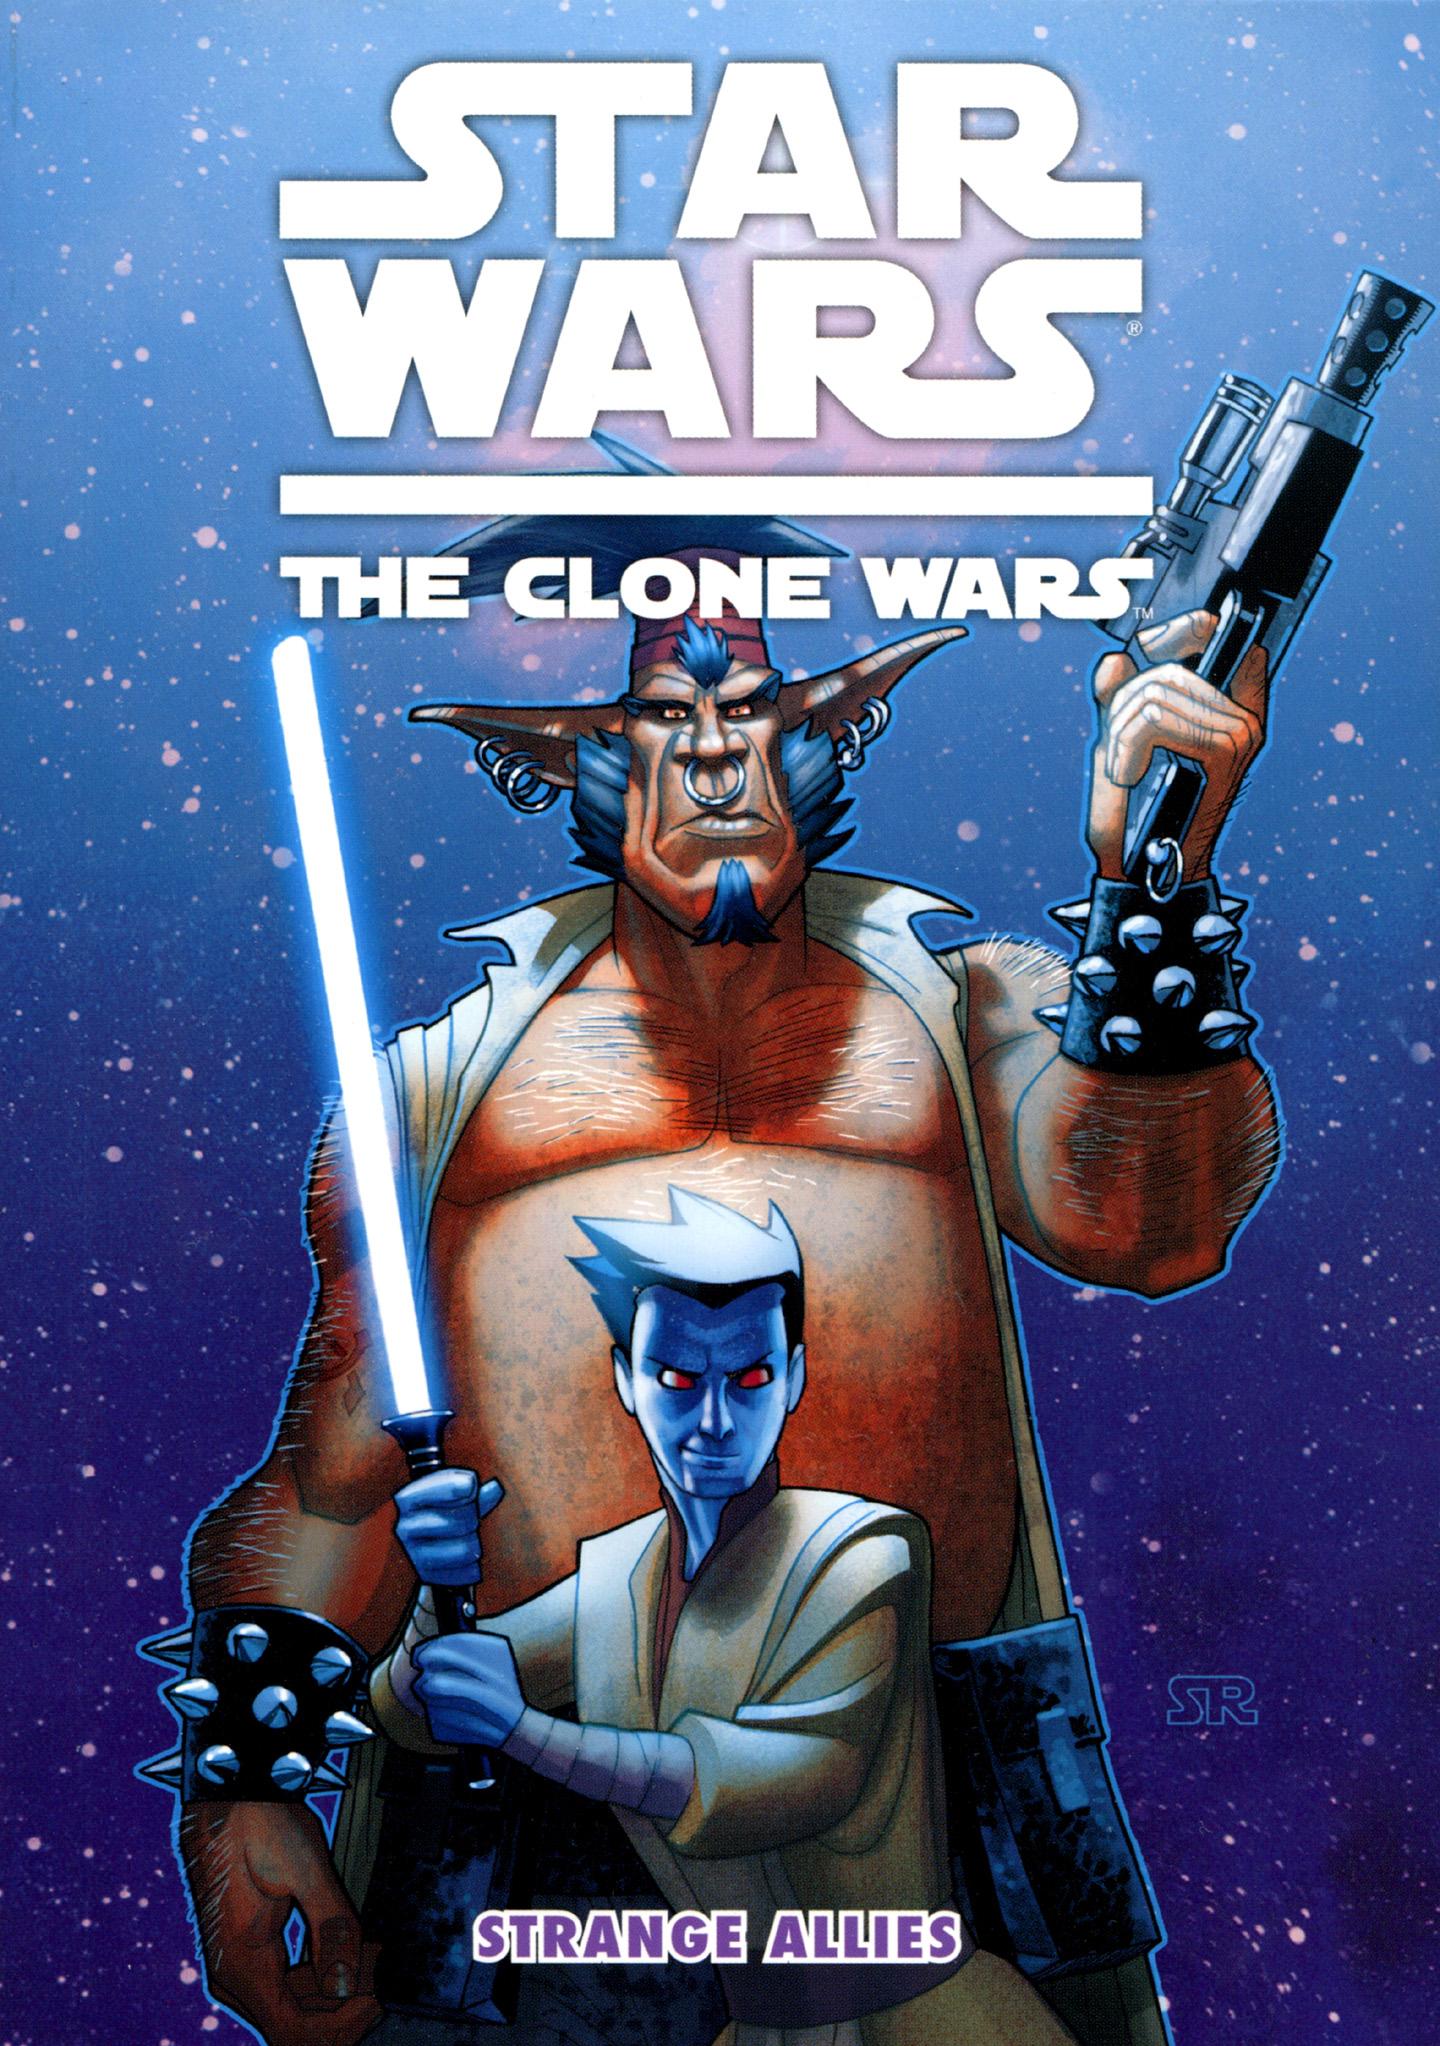 Read online Star Wars: The Clone Wars - Strange Allies comic -  Issue # Full - 1